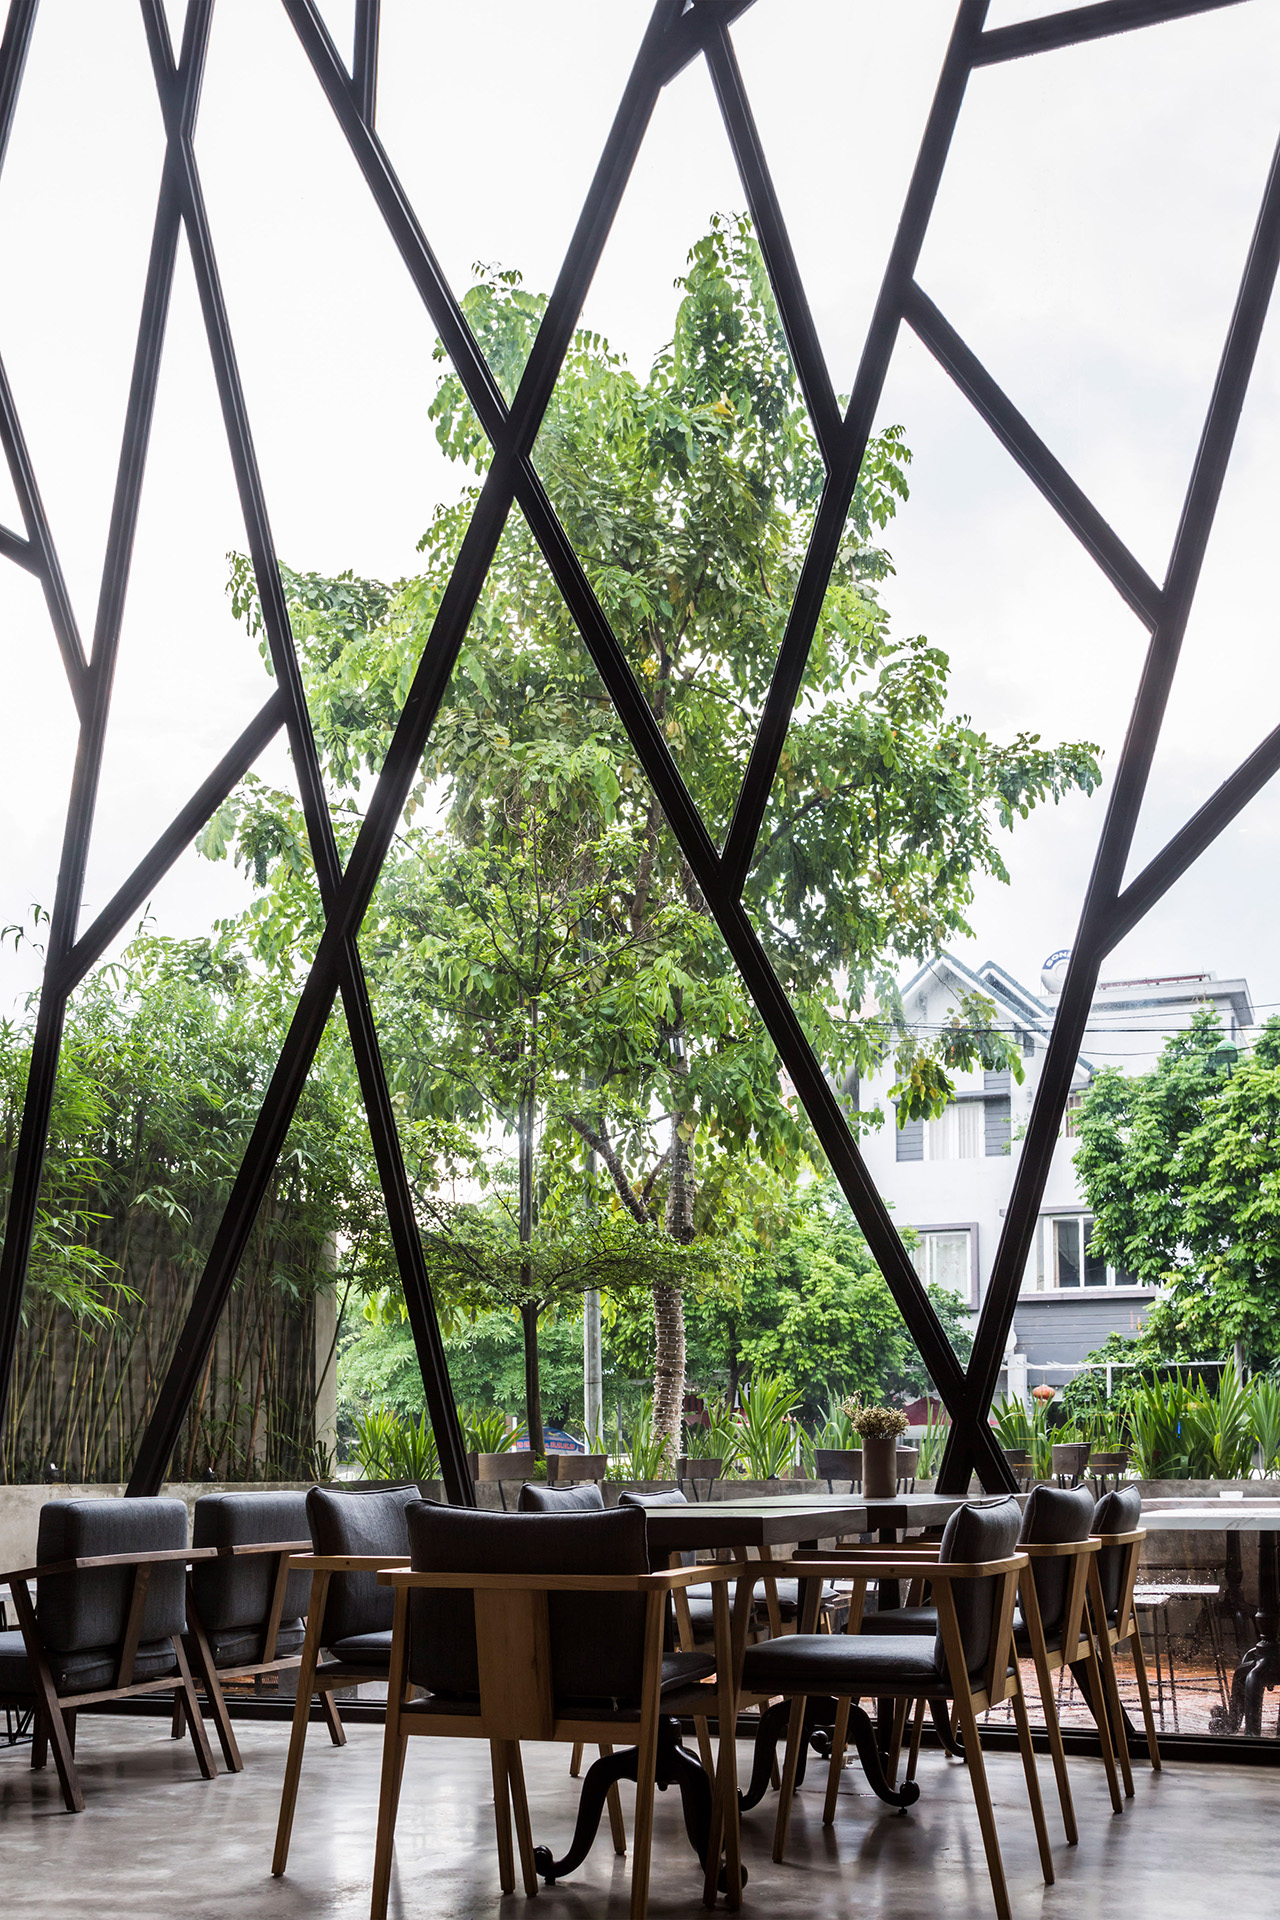 an-garden-cafe-le-house-architecture-public-and-leisure-vietname-hanoi_dezeen_2364_col_25_1280px.jpg